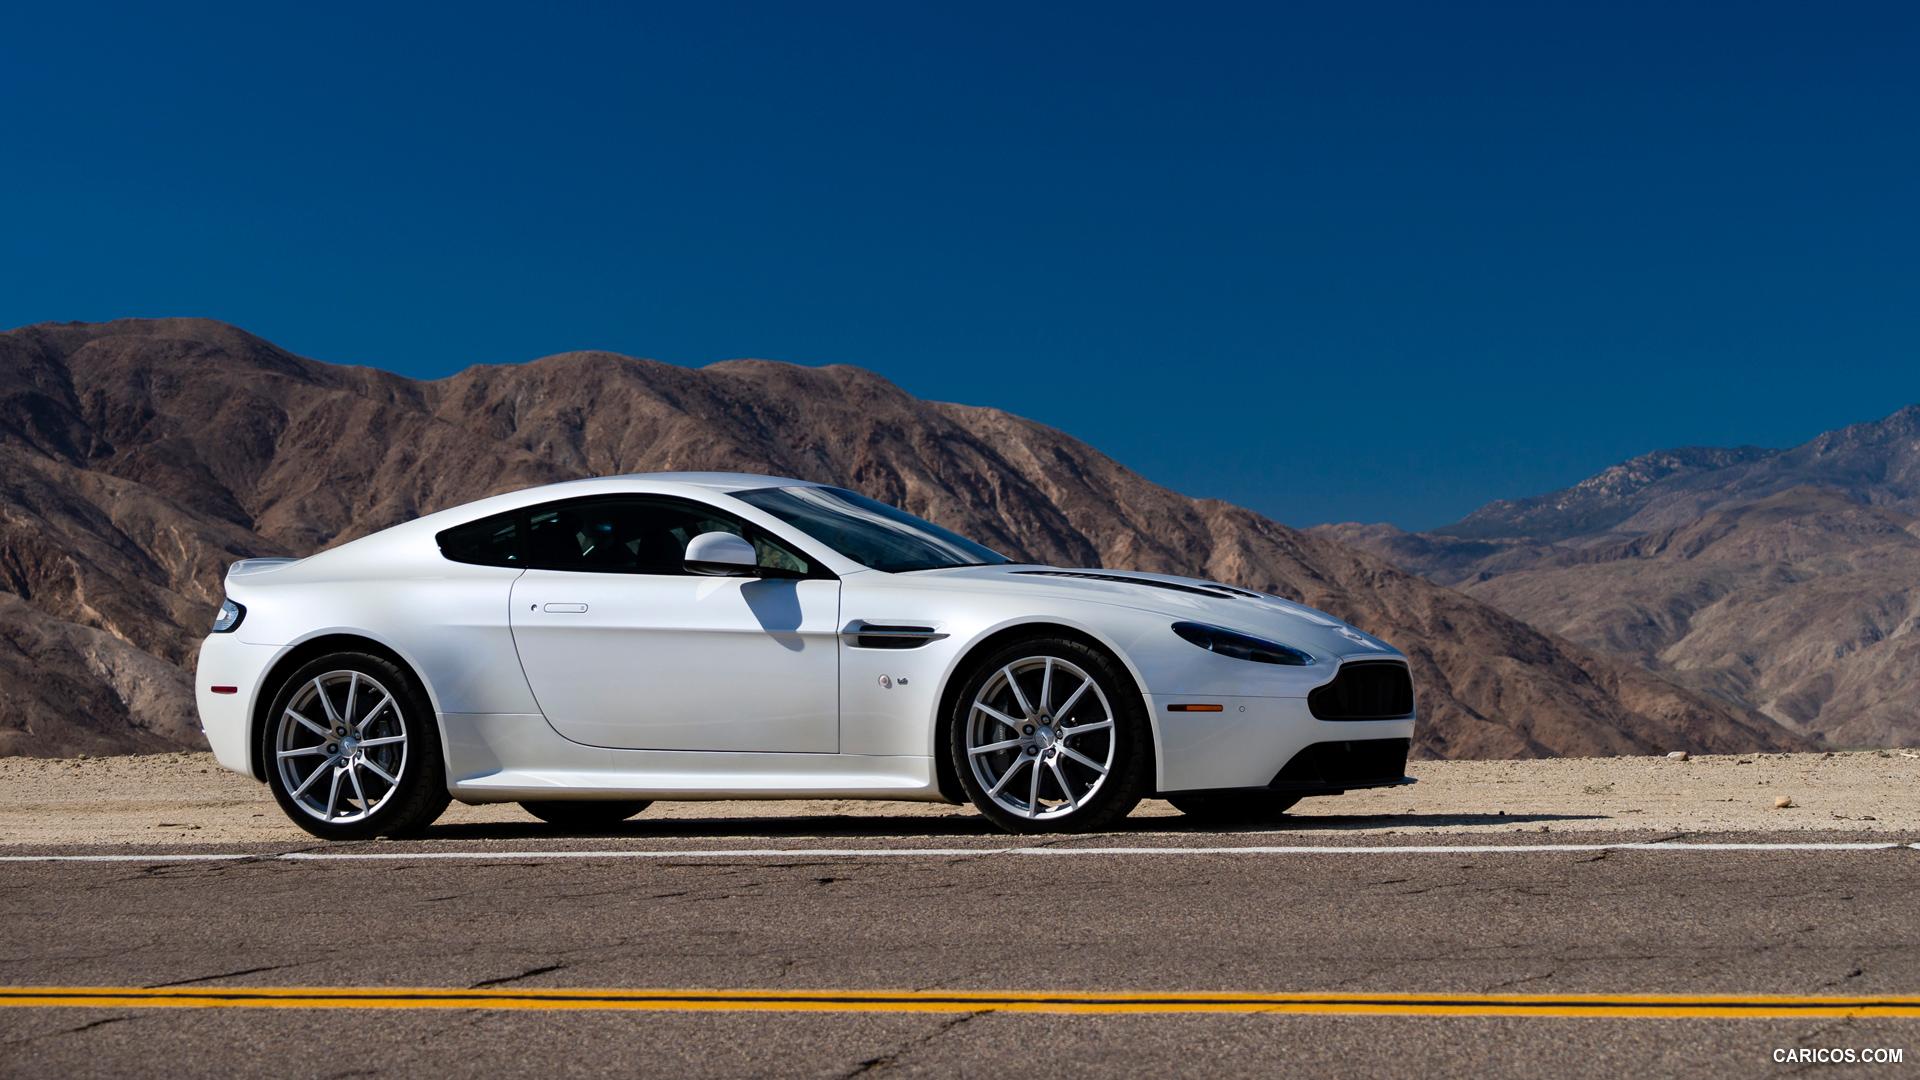 HQ 2014 Aston Martin V12 Vantage S Wallpapers | File 887.06Kb